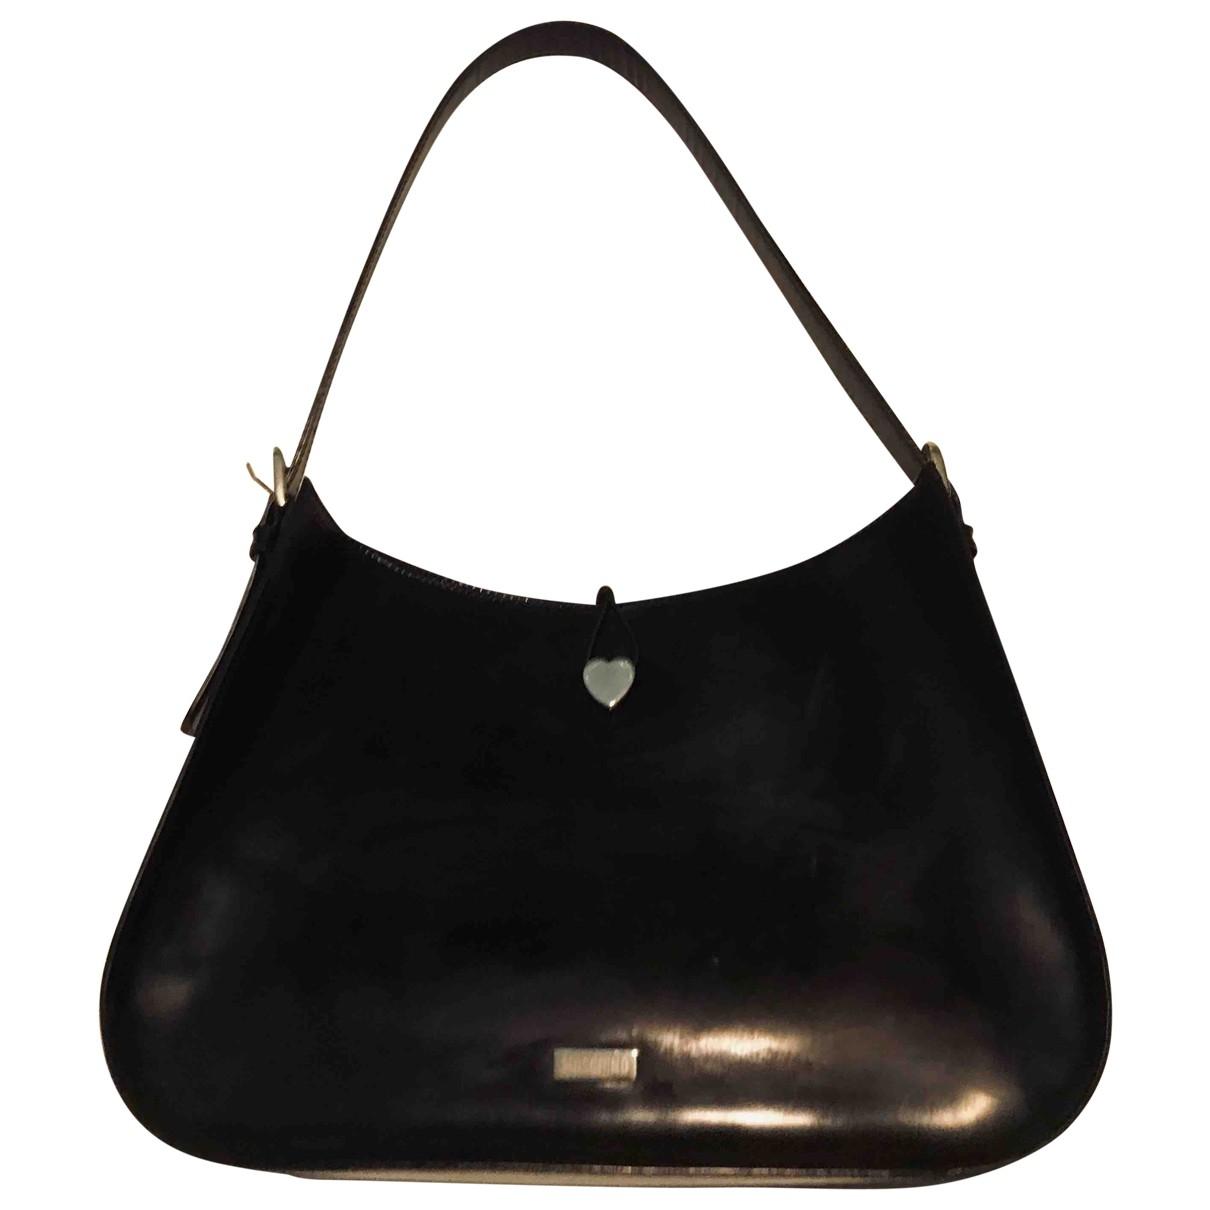 Moschino \N Black Patent leather handbag for Women \N